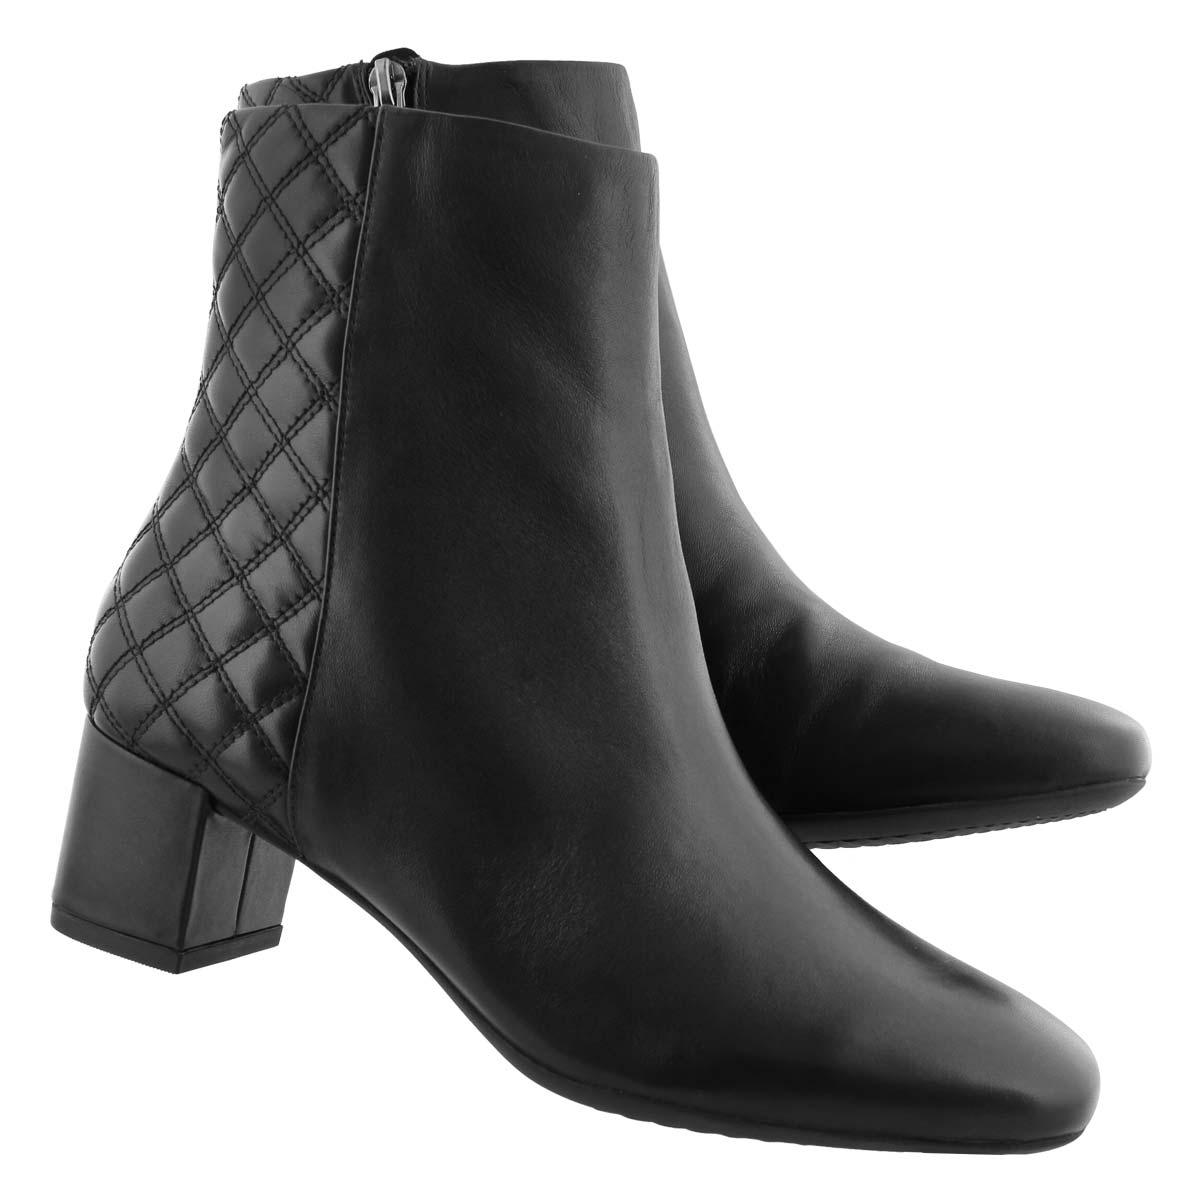 Lds Tealia Luck black dress ankle boot